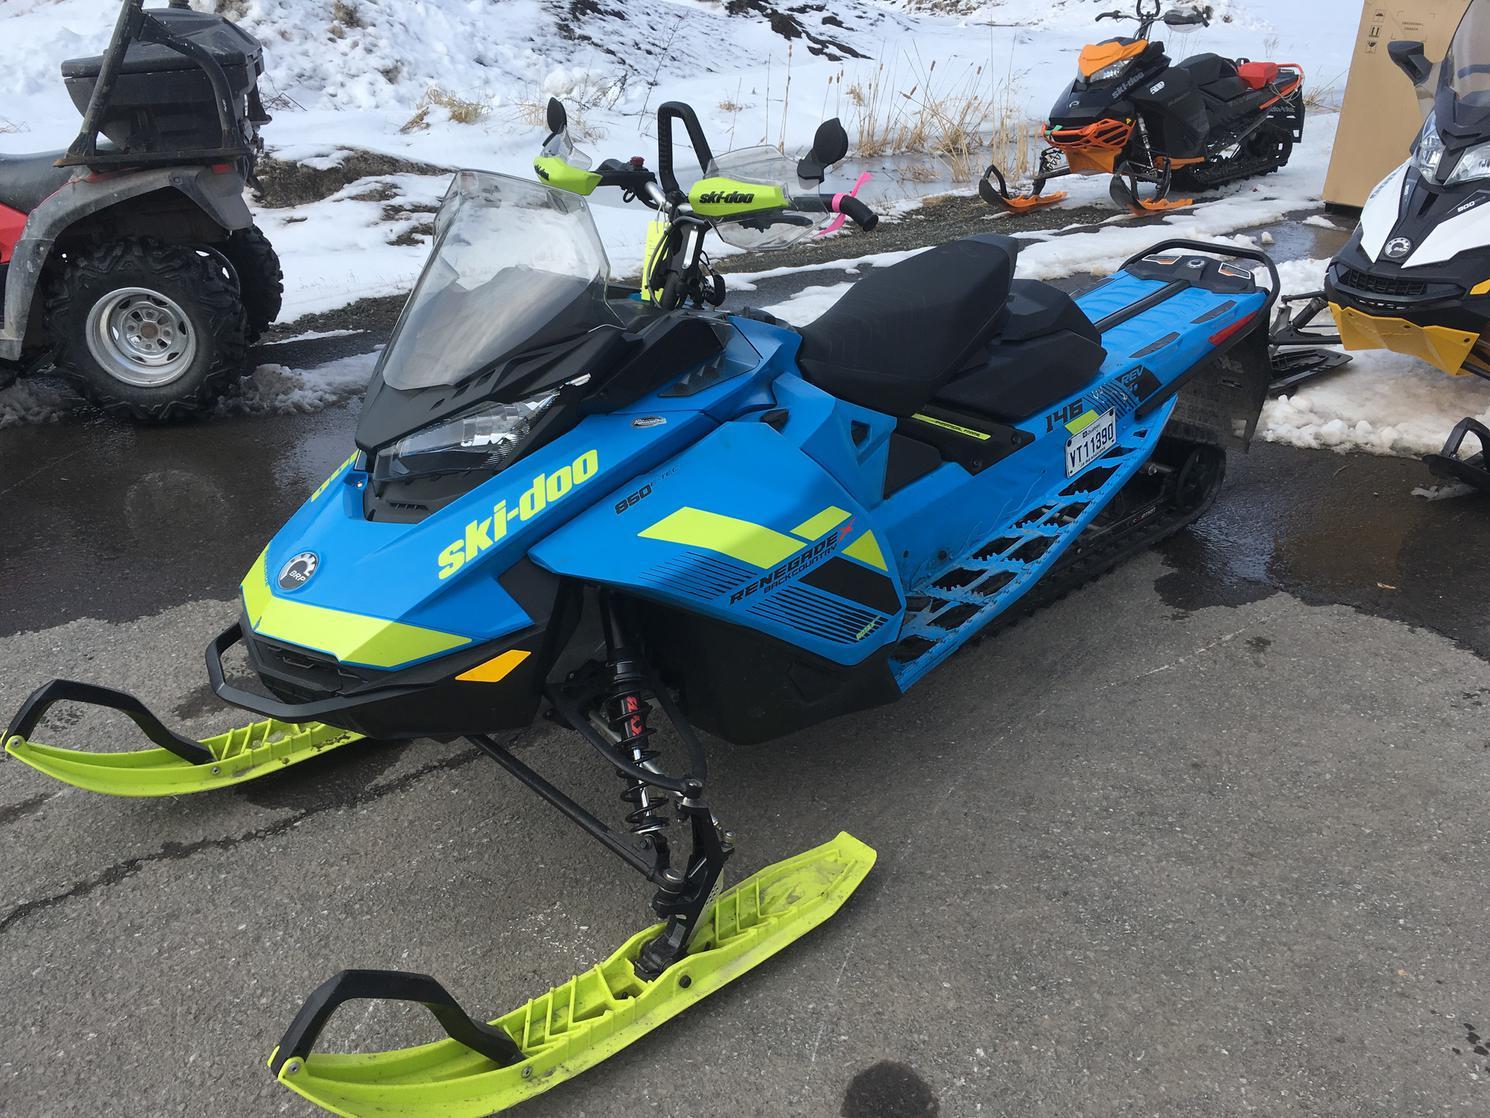 Ski-Doo RENEGADE BACKCONTRY X 850 2018